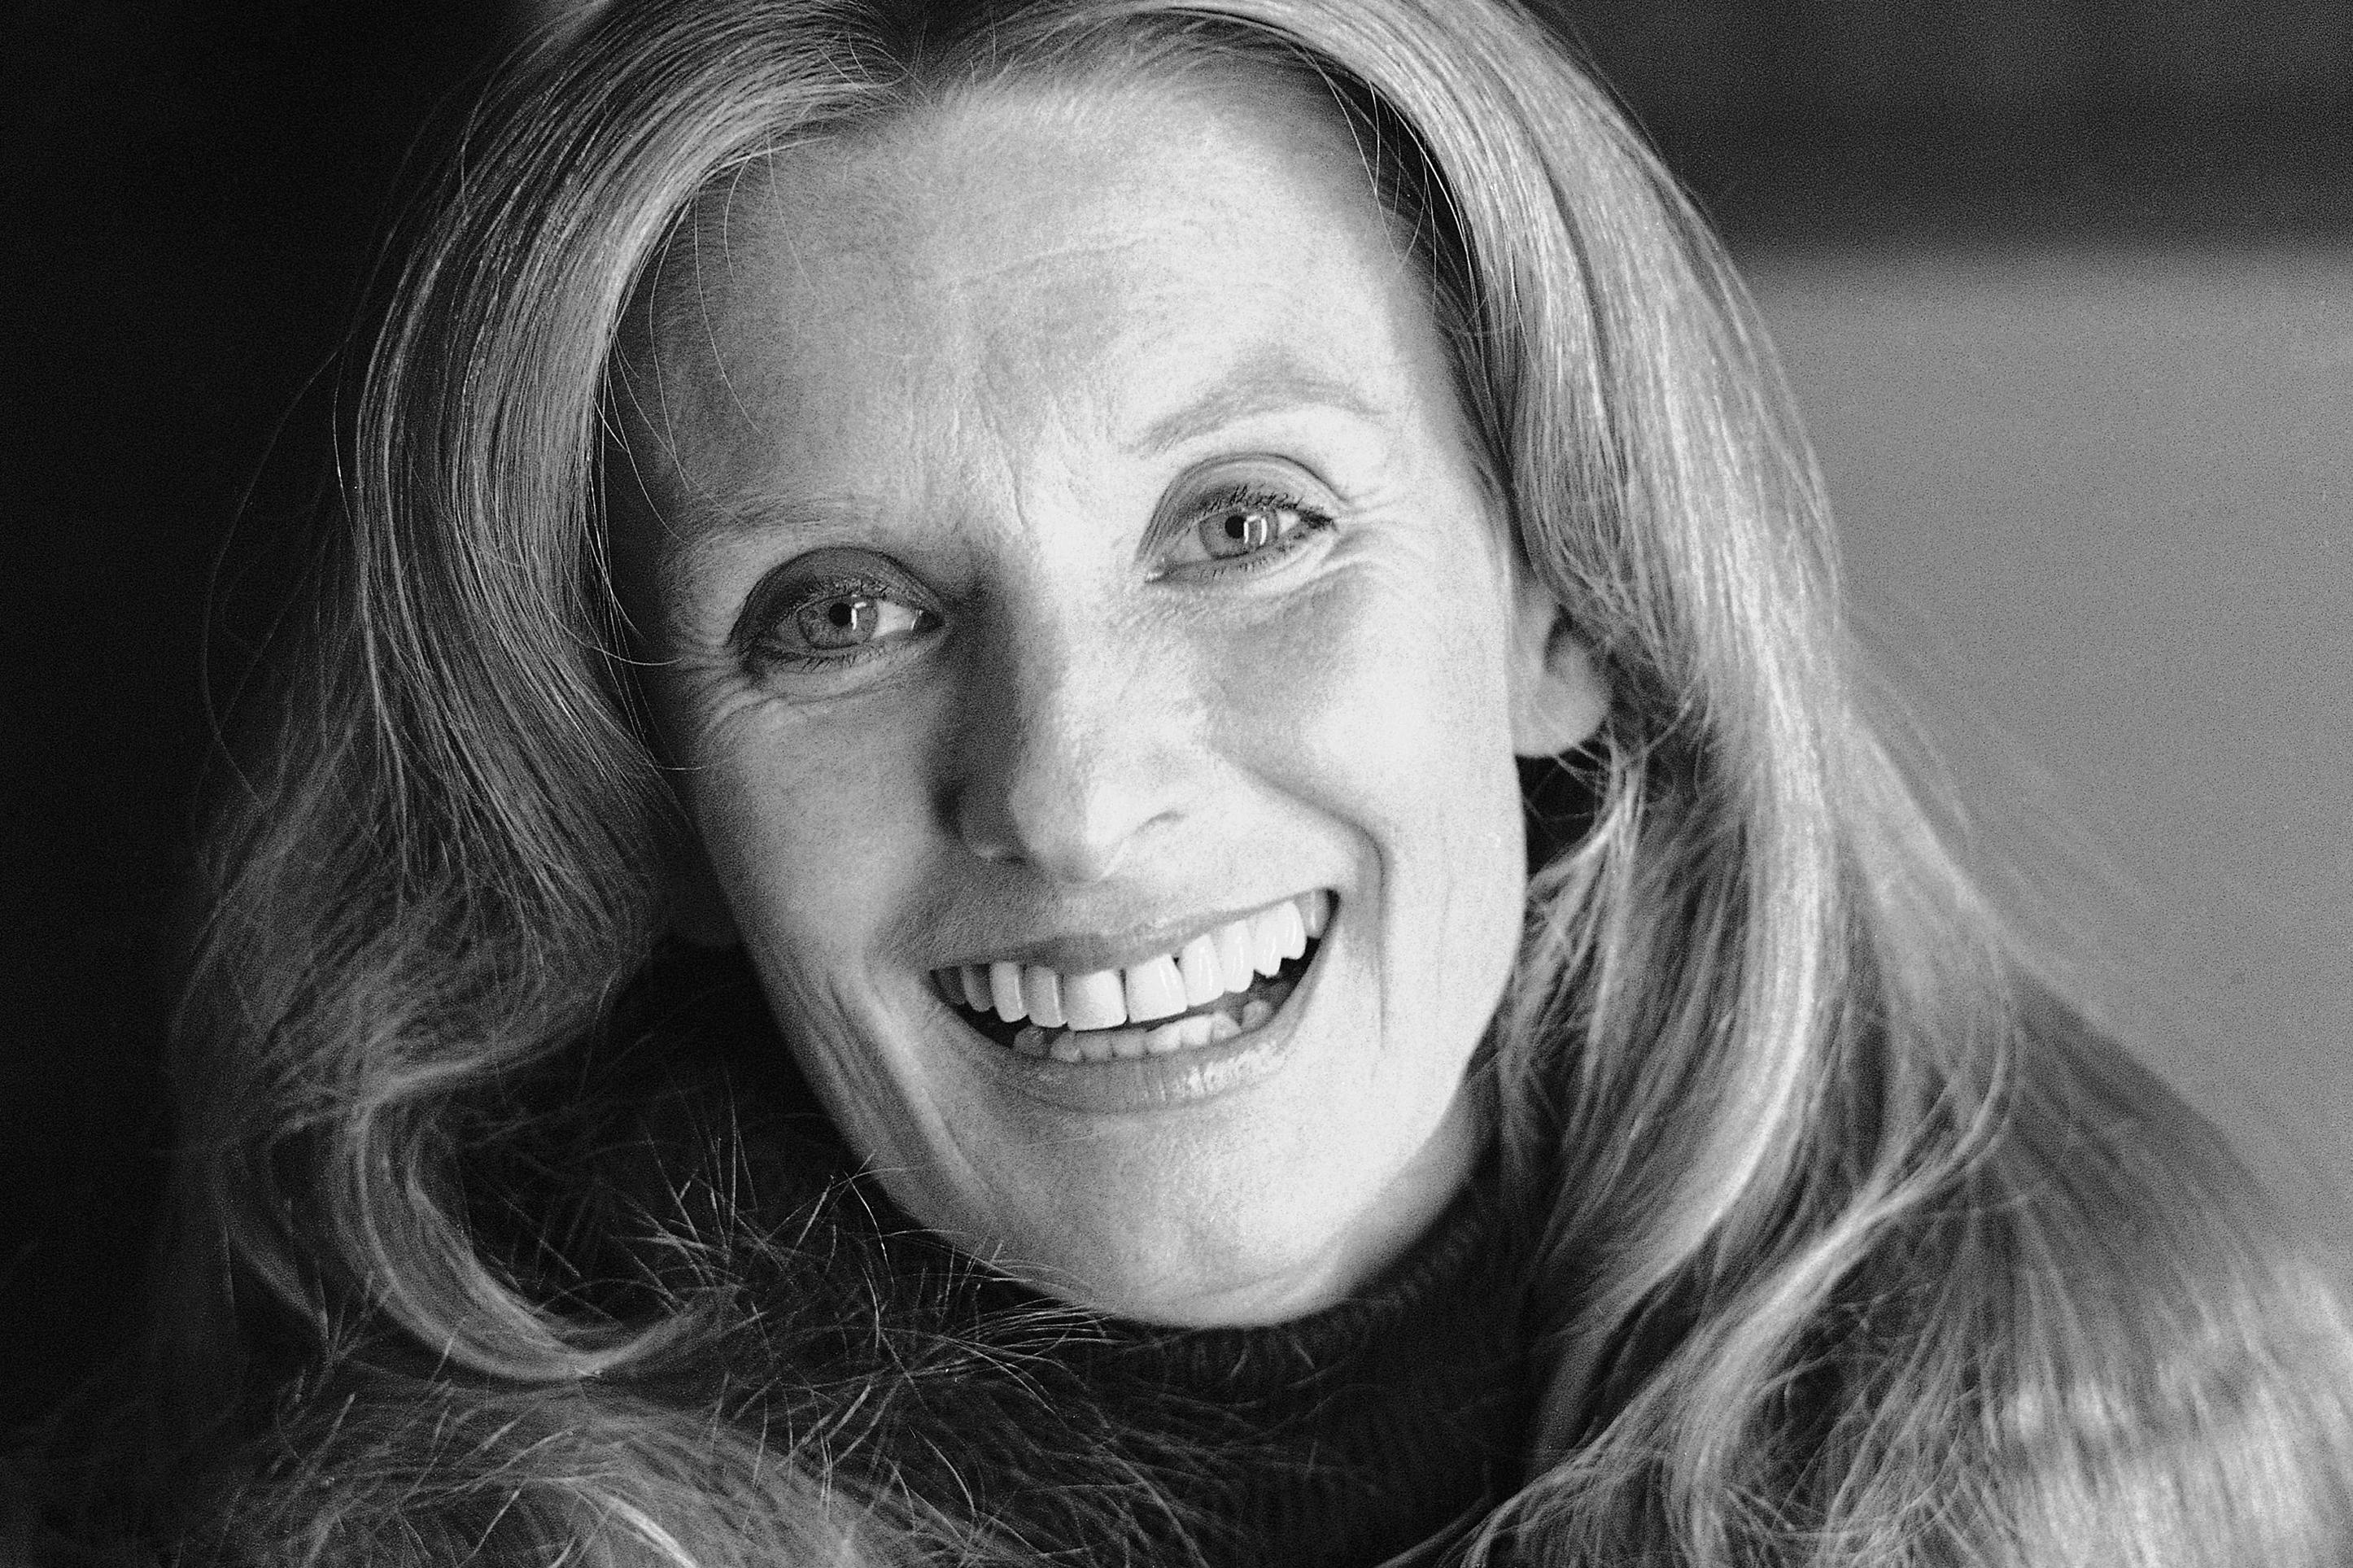 Cloris Leachman, legendary actress, dead at 94